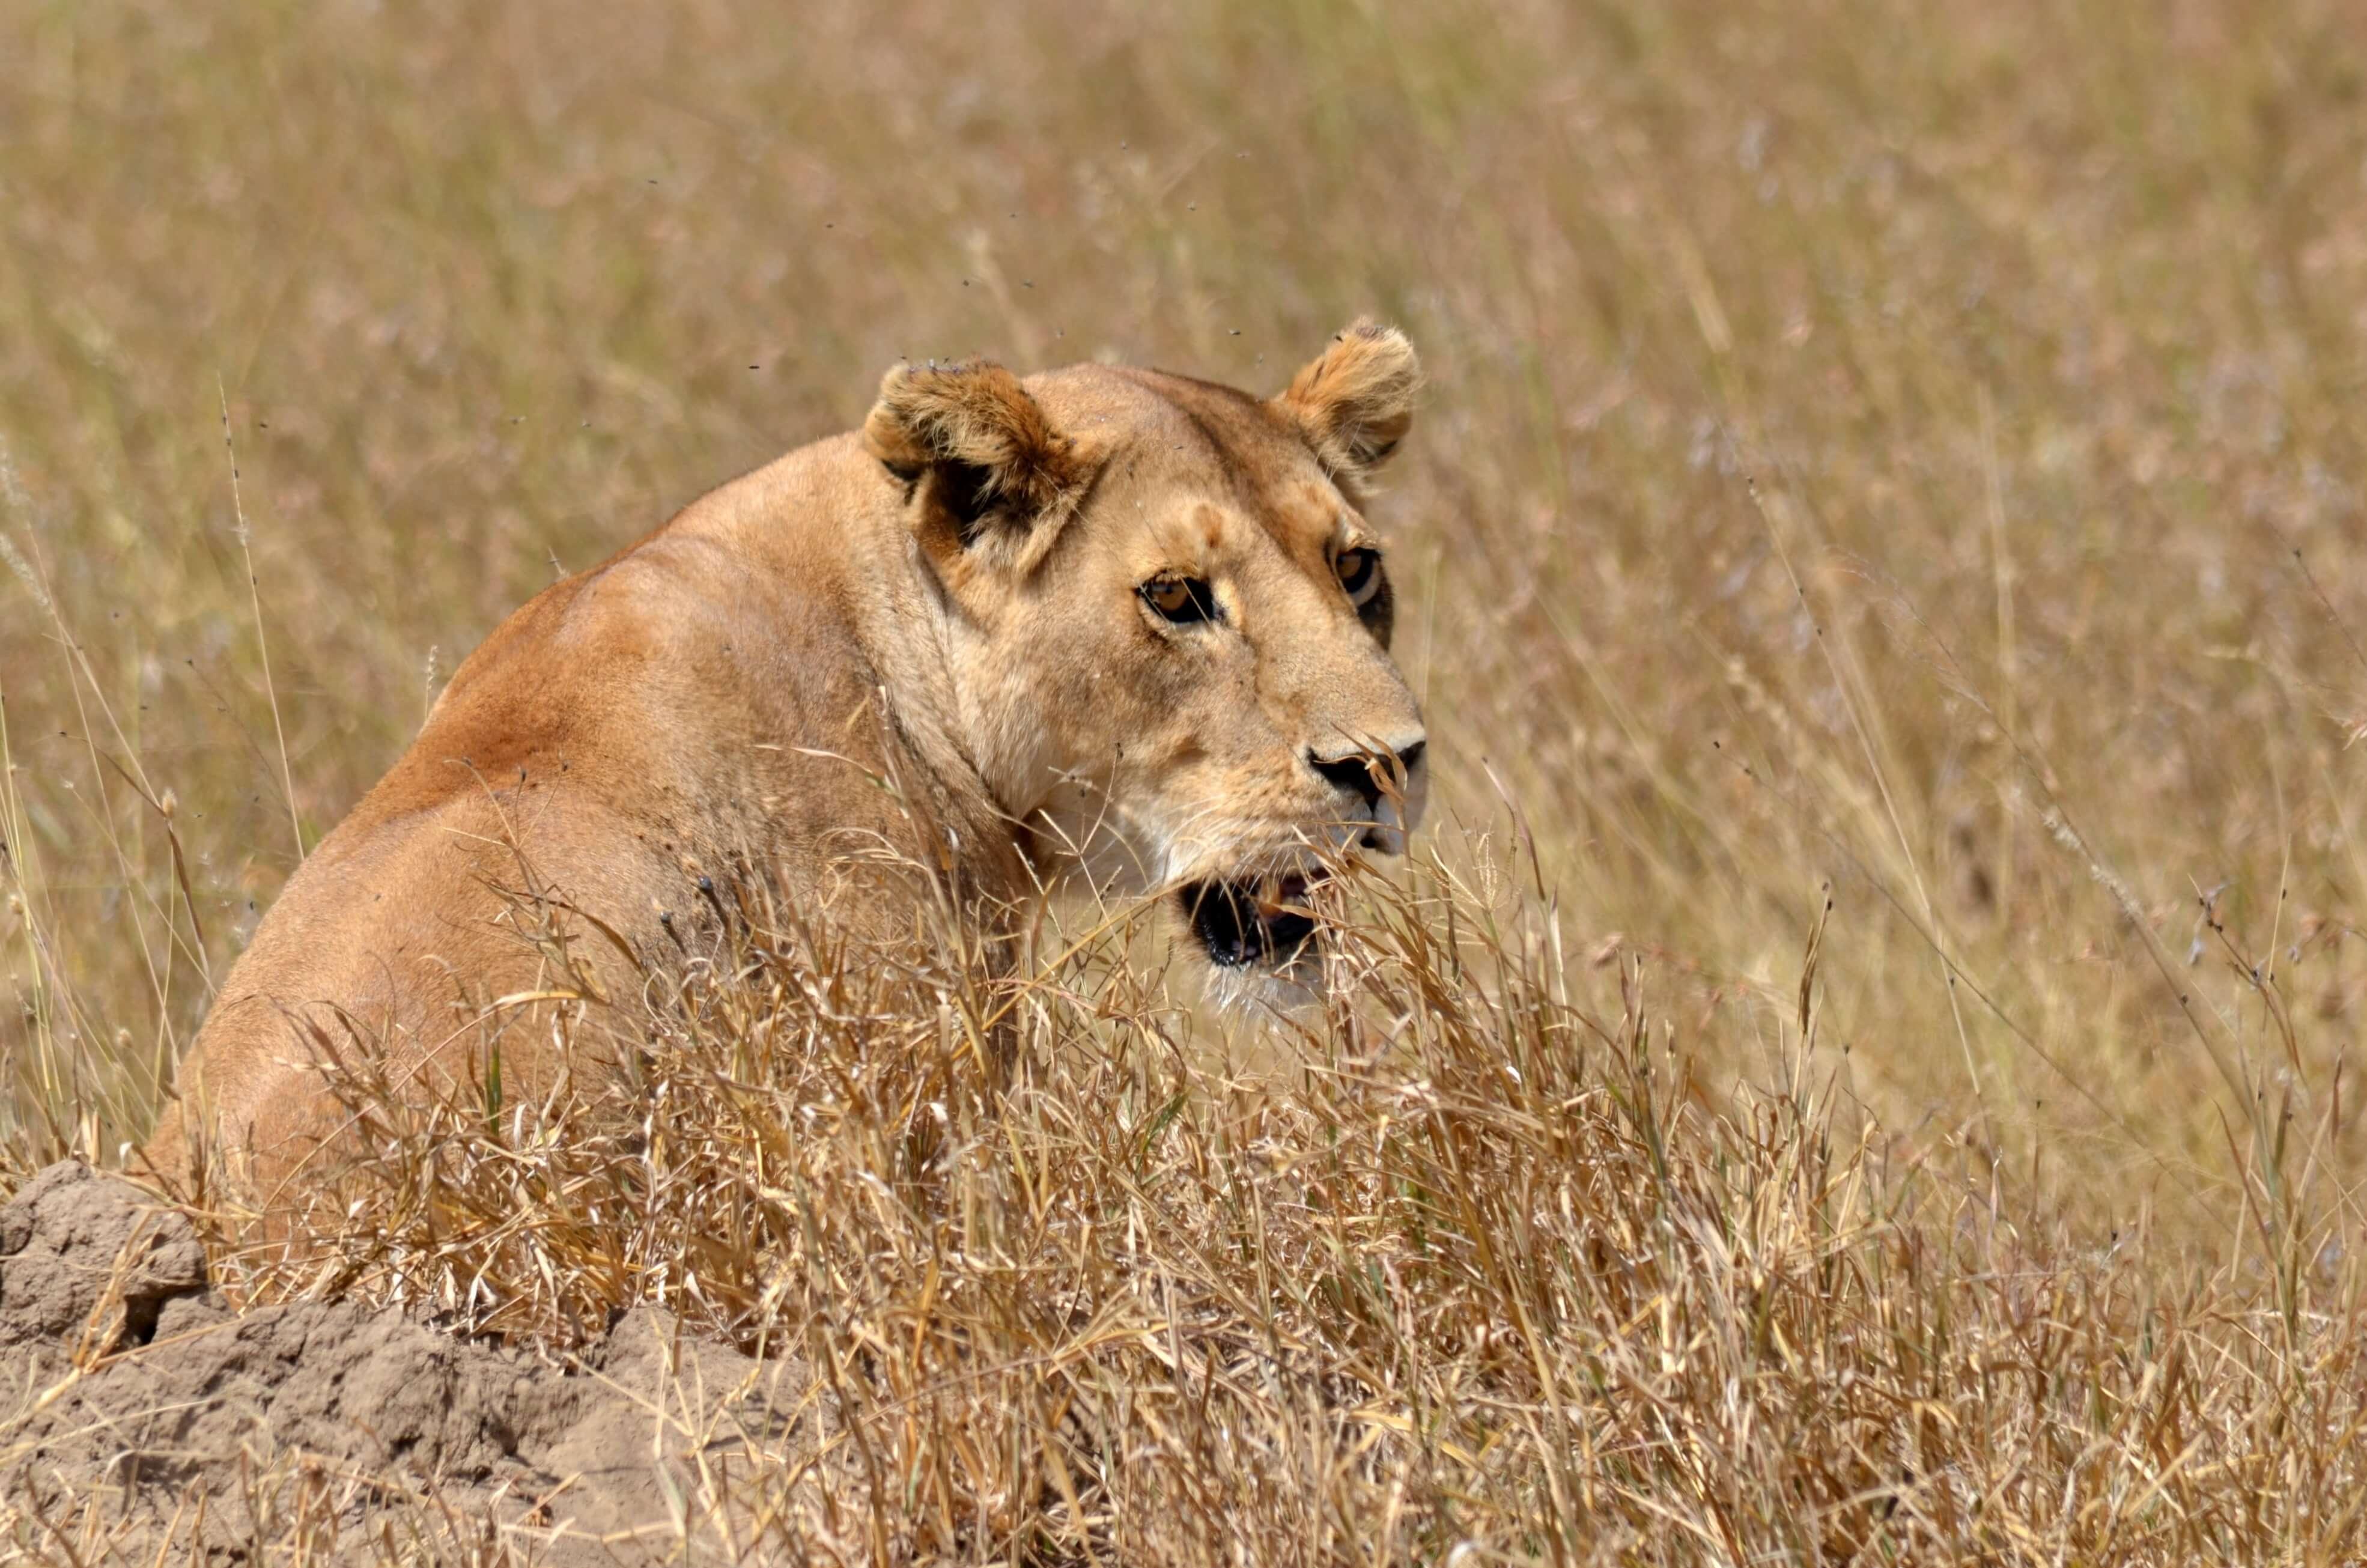 Lion in savannah grass in masai mara kenya africa - safari should be top of your bucket list experiences